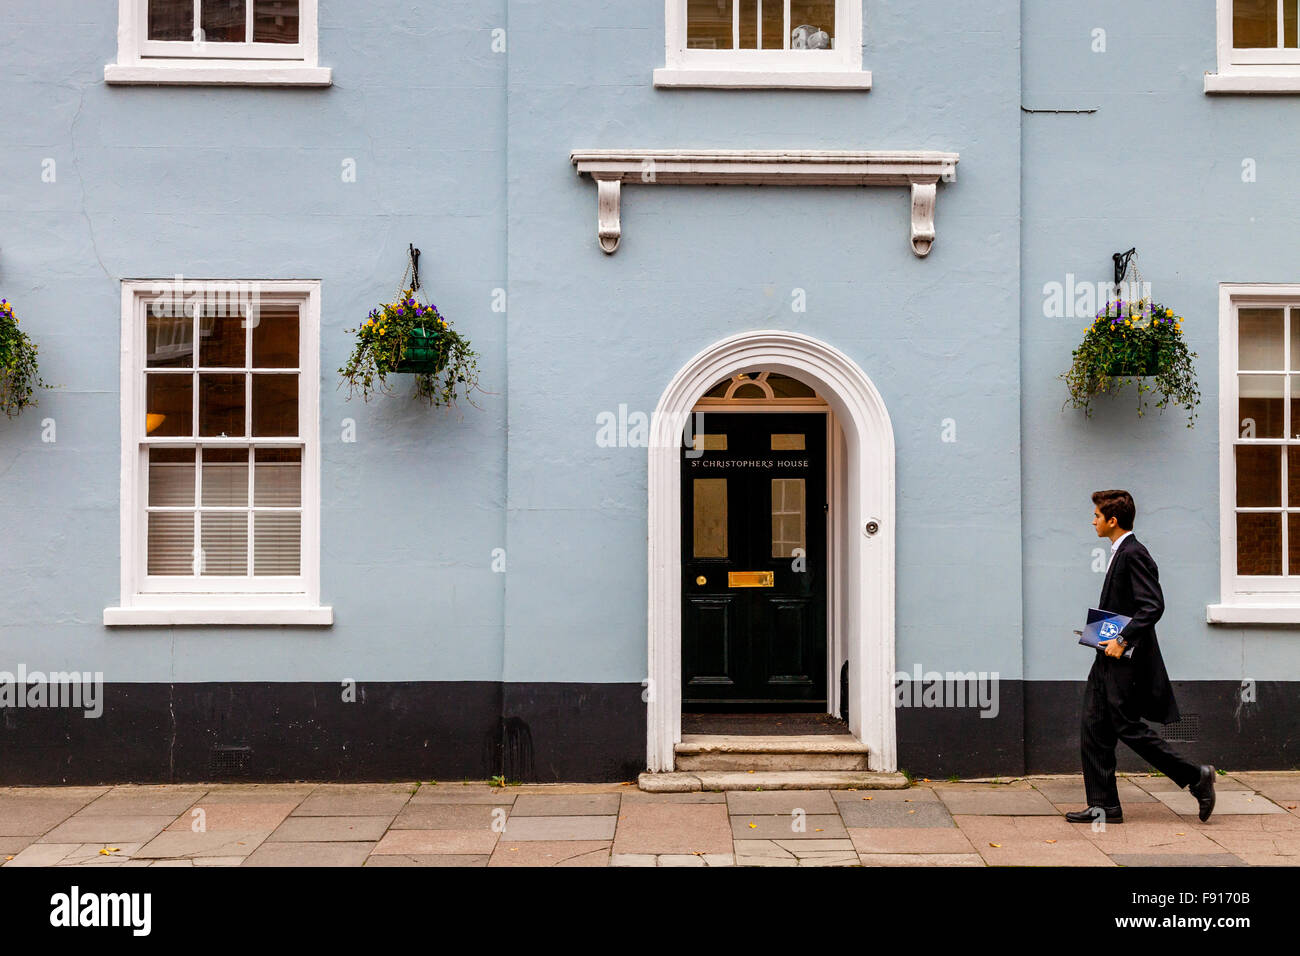 Eton Schoolboy, High Street, Eton, Berkshire, UK - Stock Image